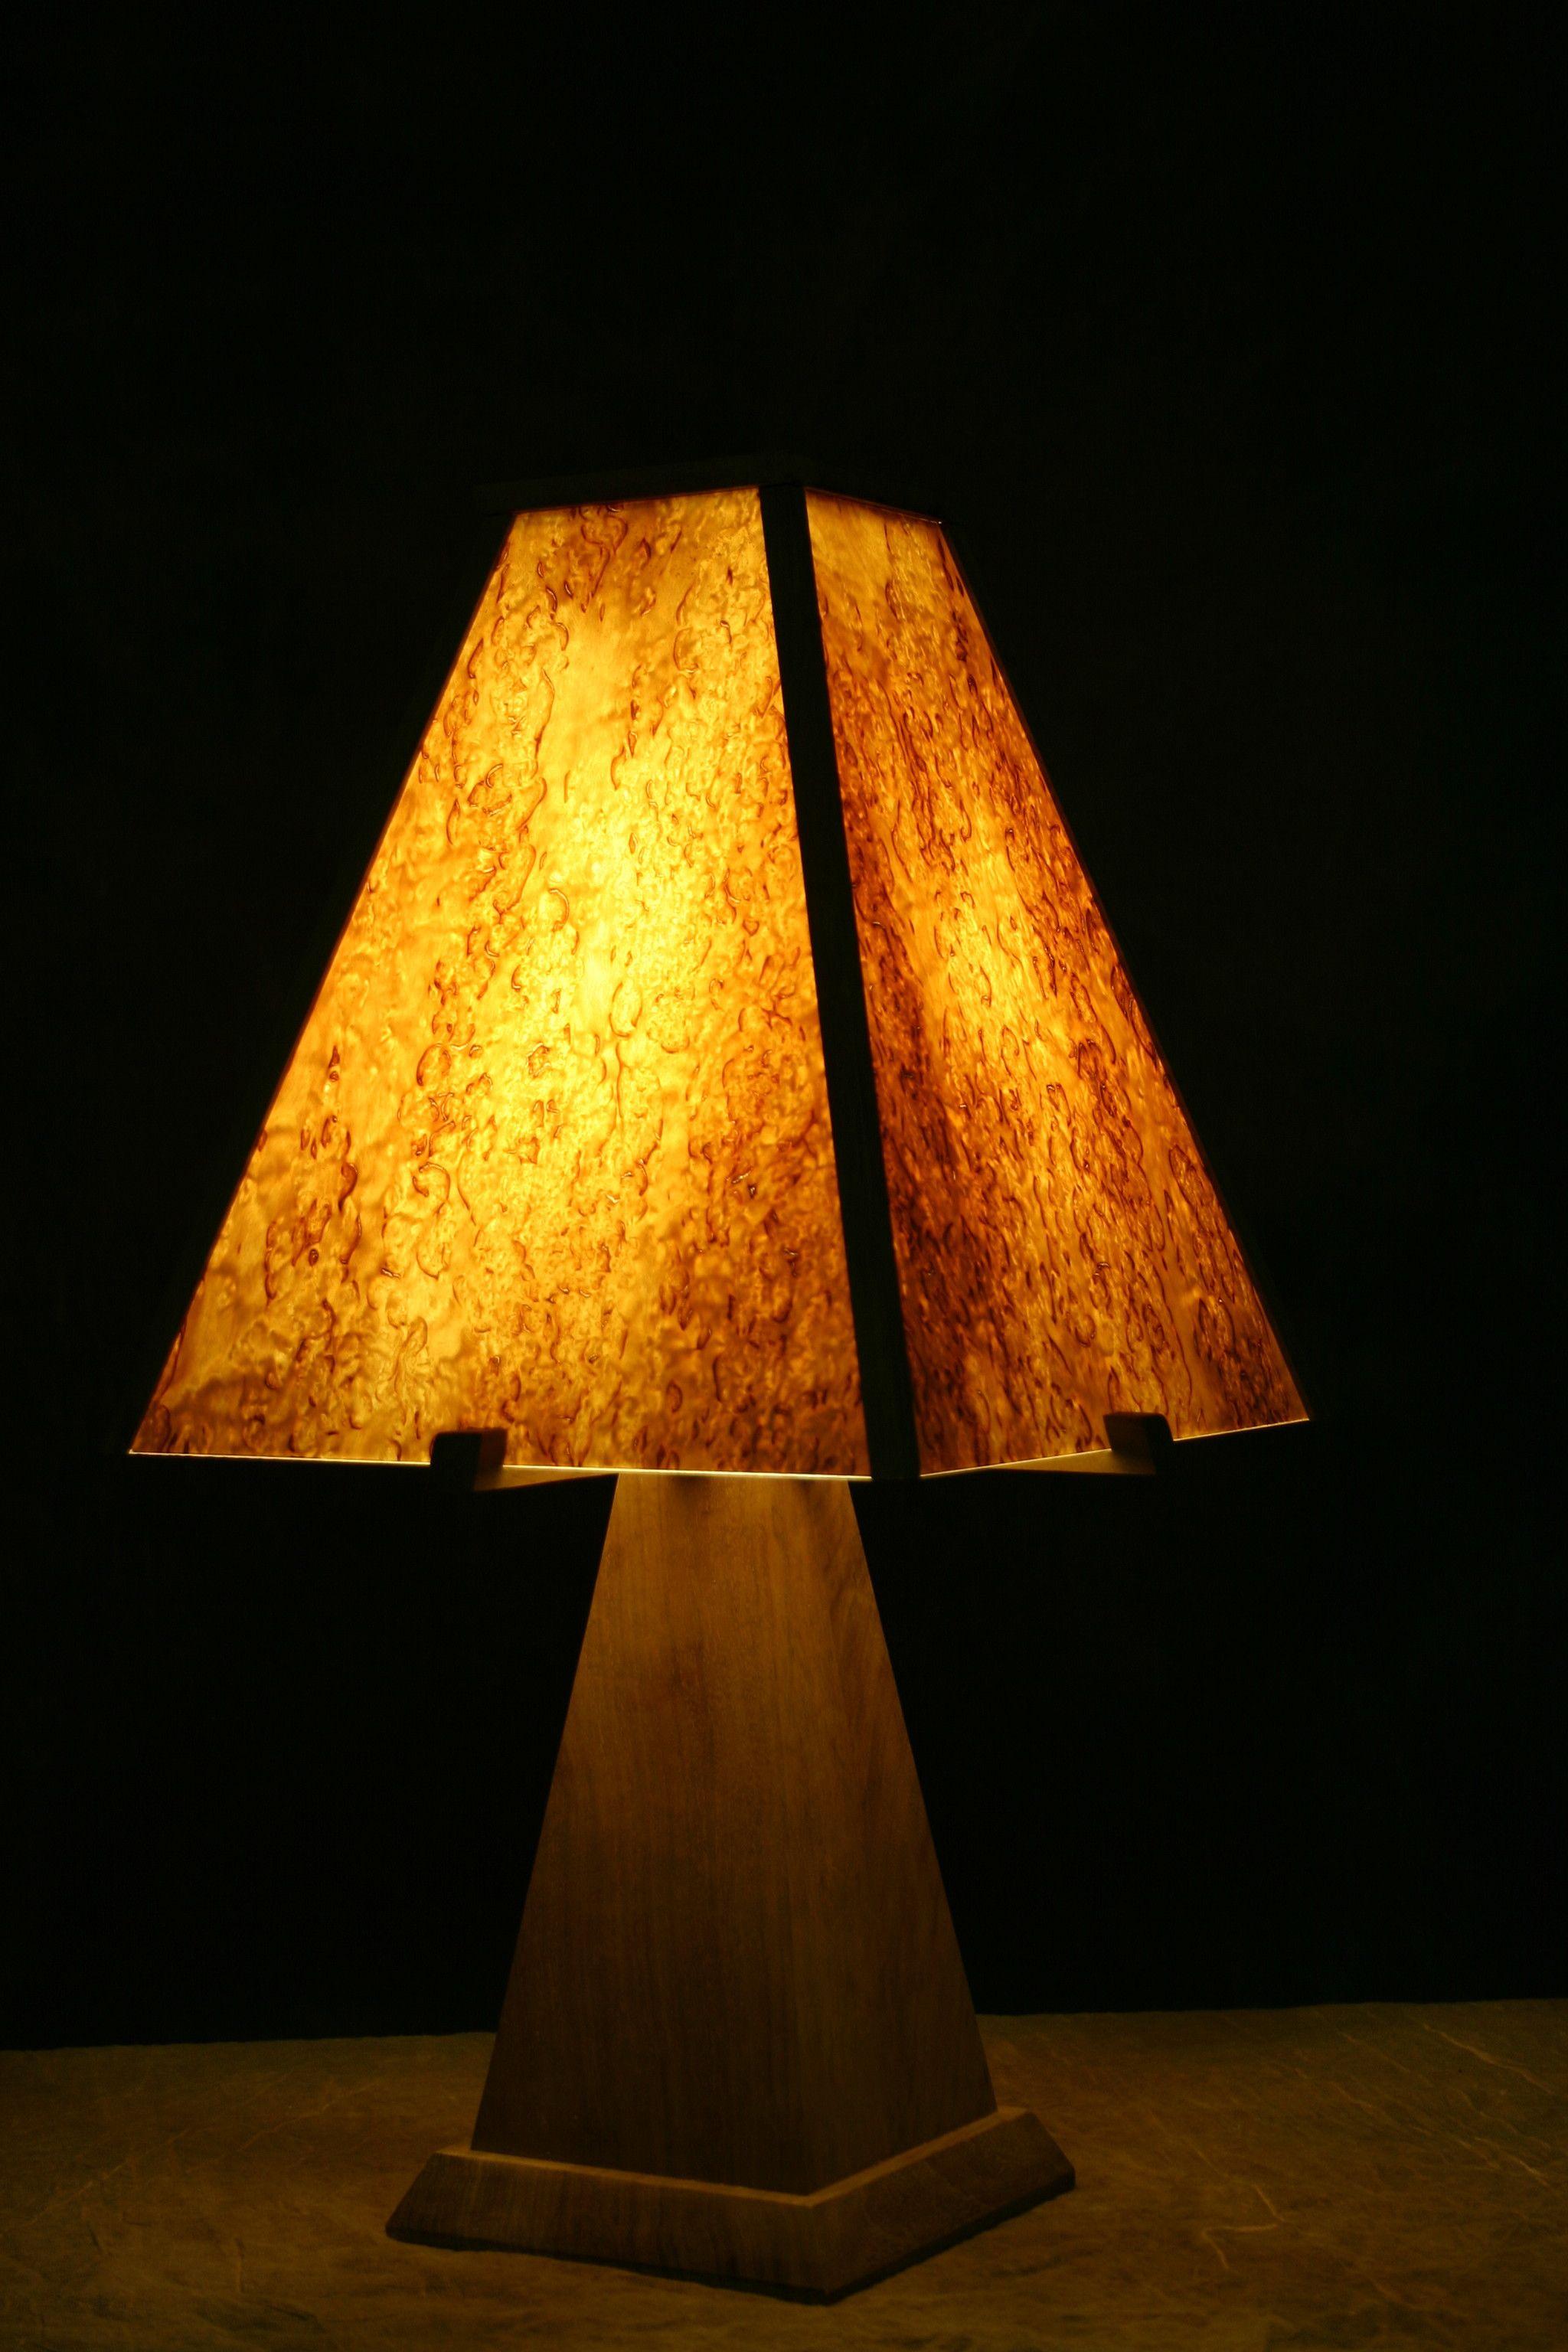 Buy A Handmade Karelian Birch Burl And Walnut Lamp Made